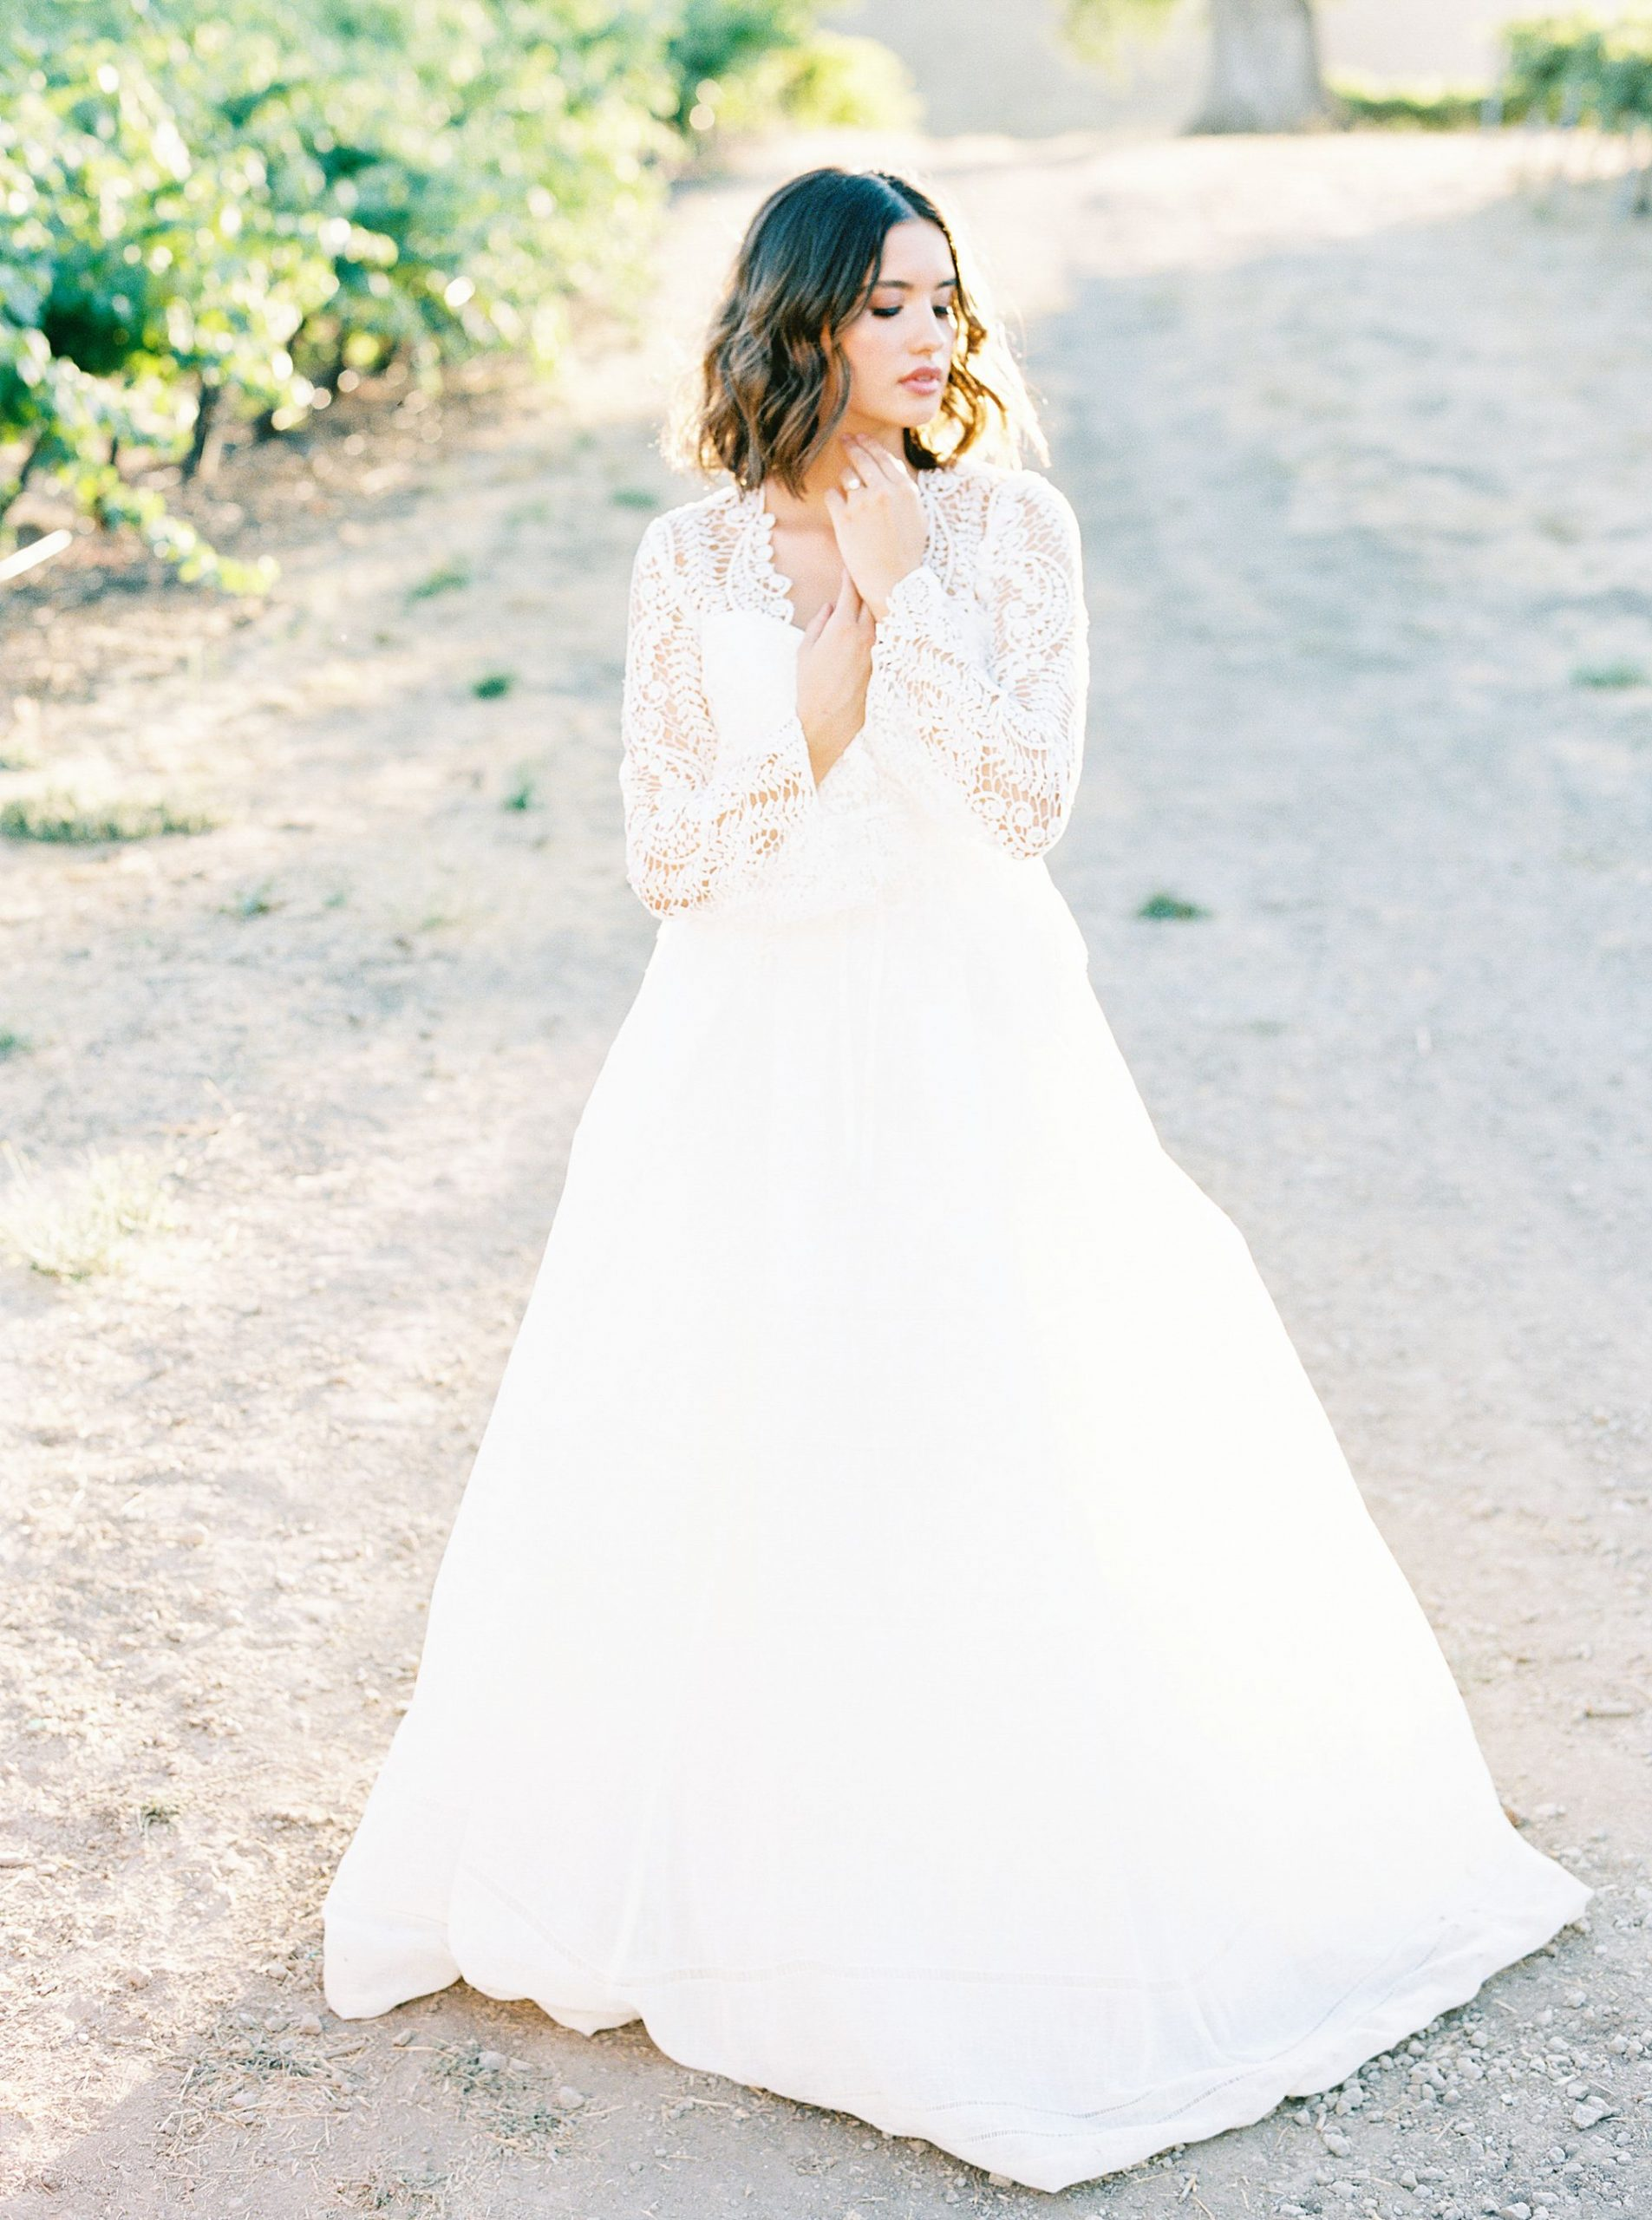 HammerSky Wedding Inspiration Featured on Hey Wedding Lady with Vanessa Noel Events - Ashley Baumgartner - SLO Wedding Photographer_0040.jpg